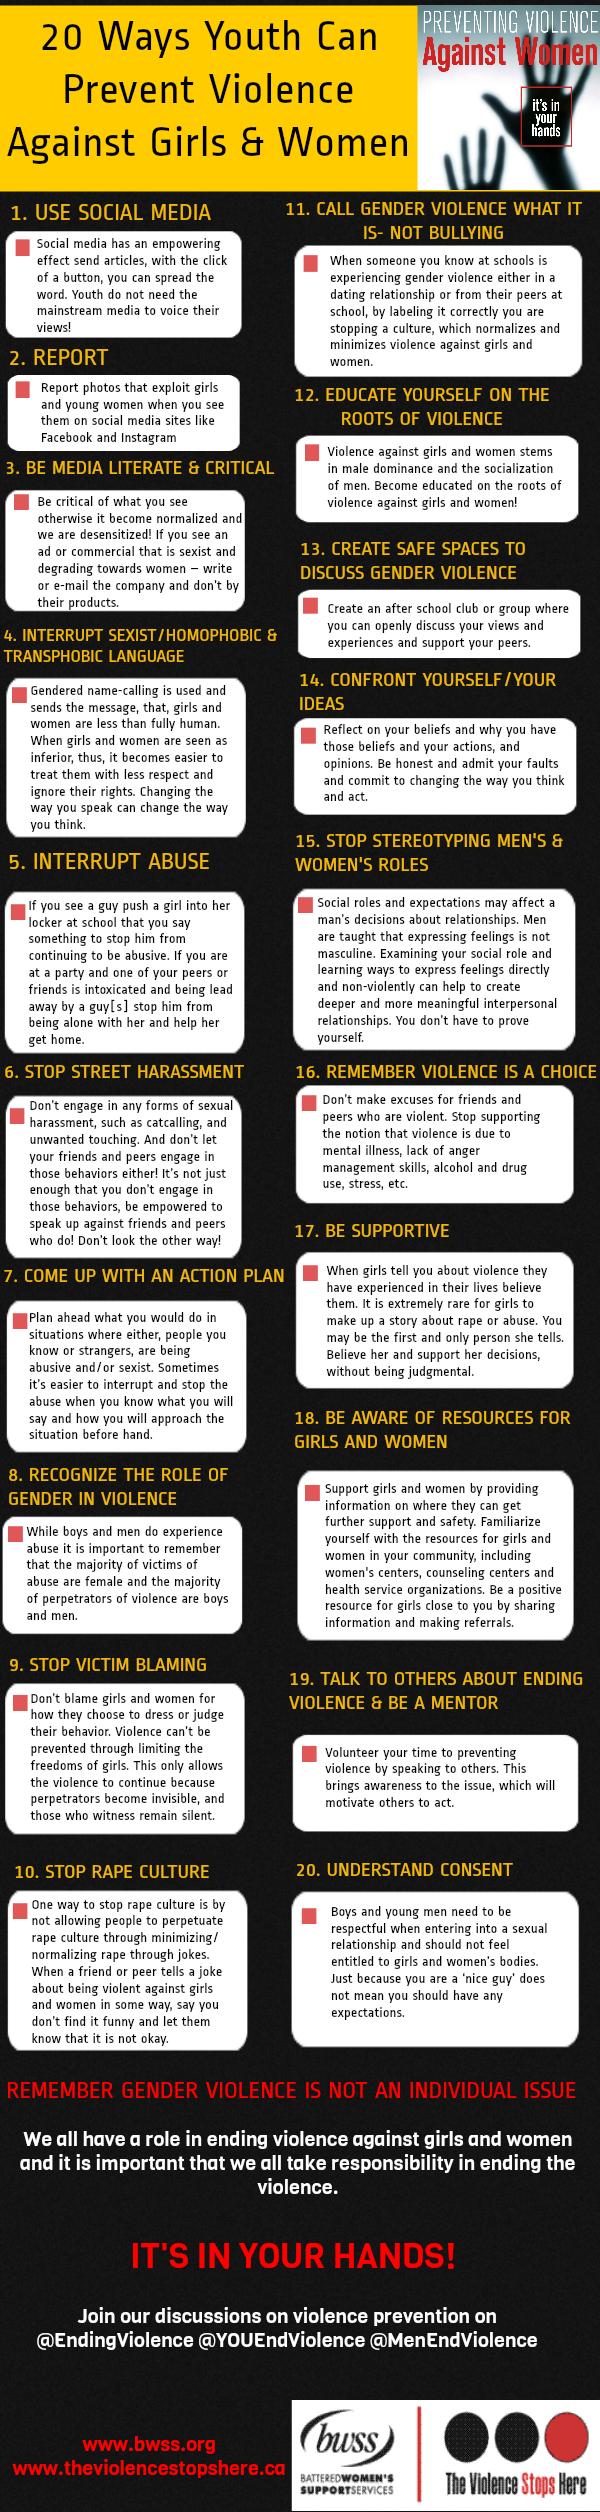 Florida dating violence vs domestic violence